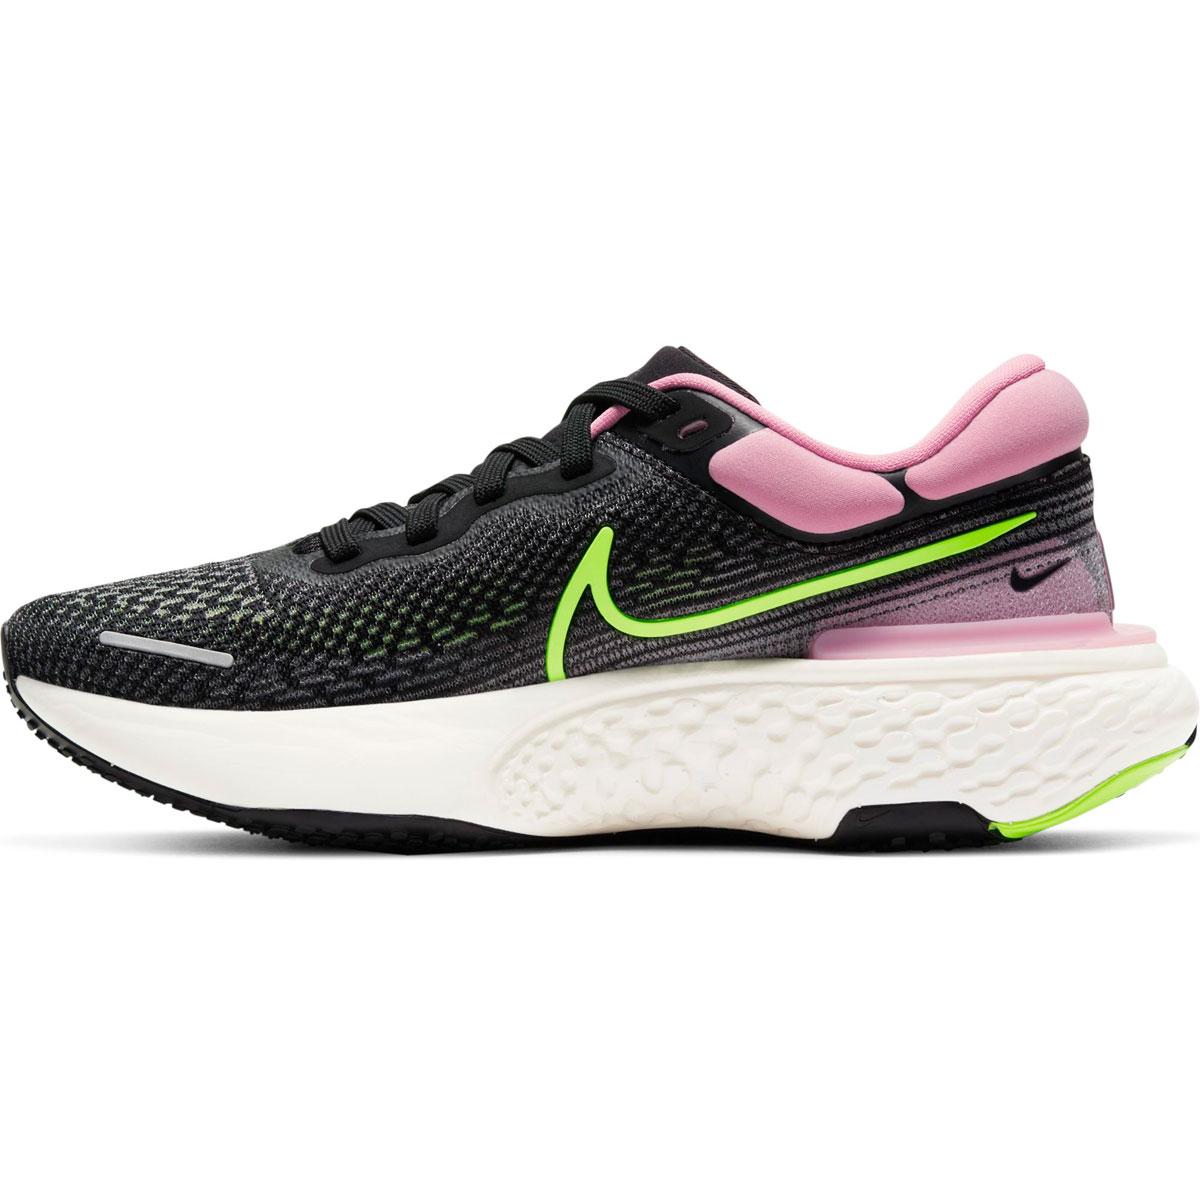 Women's Nike Zoomx Invincible Run FlyKnit Running Shoe - Color: Black/Cyber/Elemental Pink - Size: 6 - Width: Regular, Black/Cyber/Elemental Pink, large, image 2